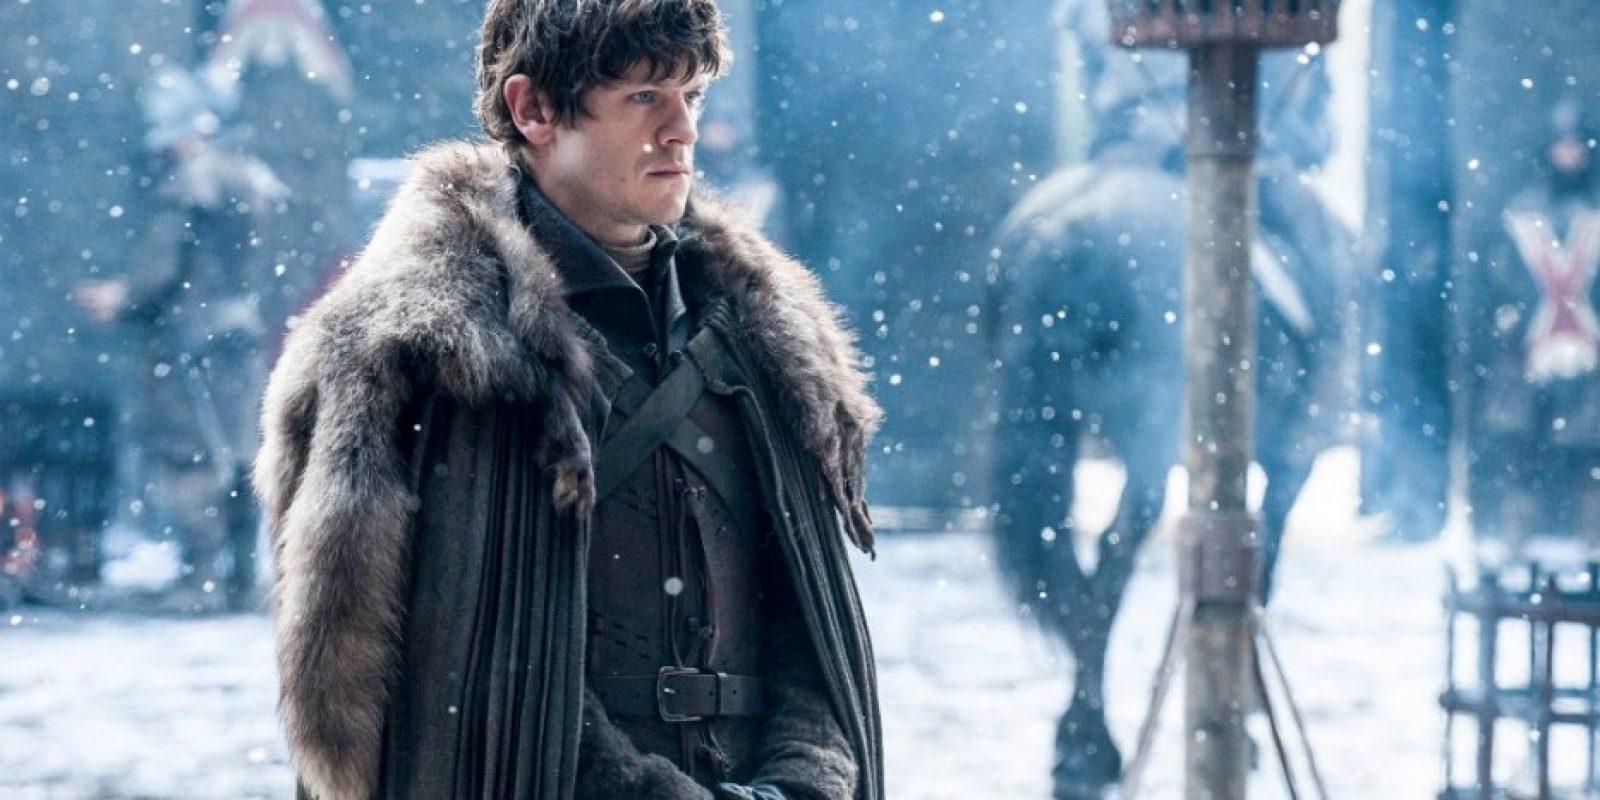 . Imagen Por: Vía Facebook/Game of Thrones